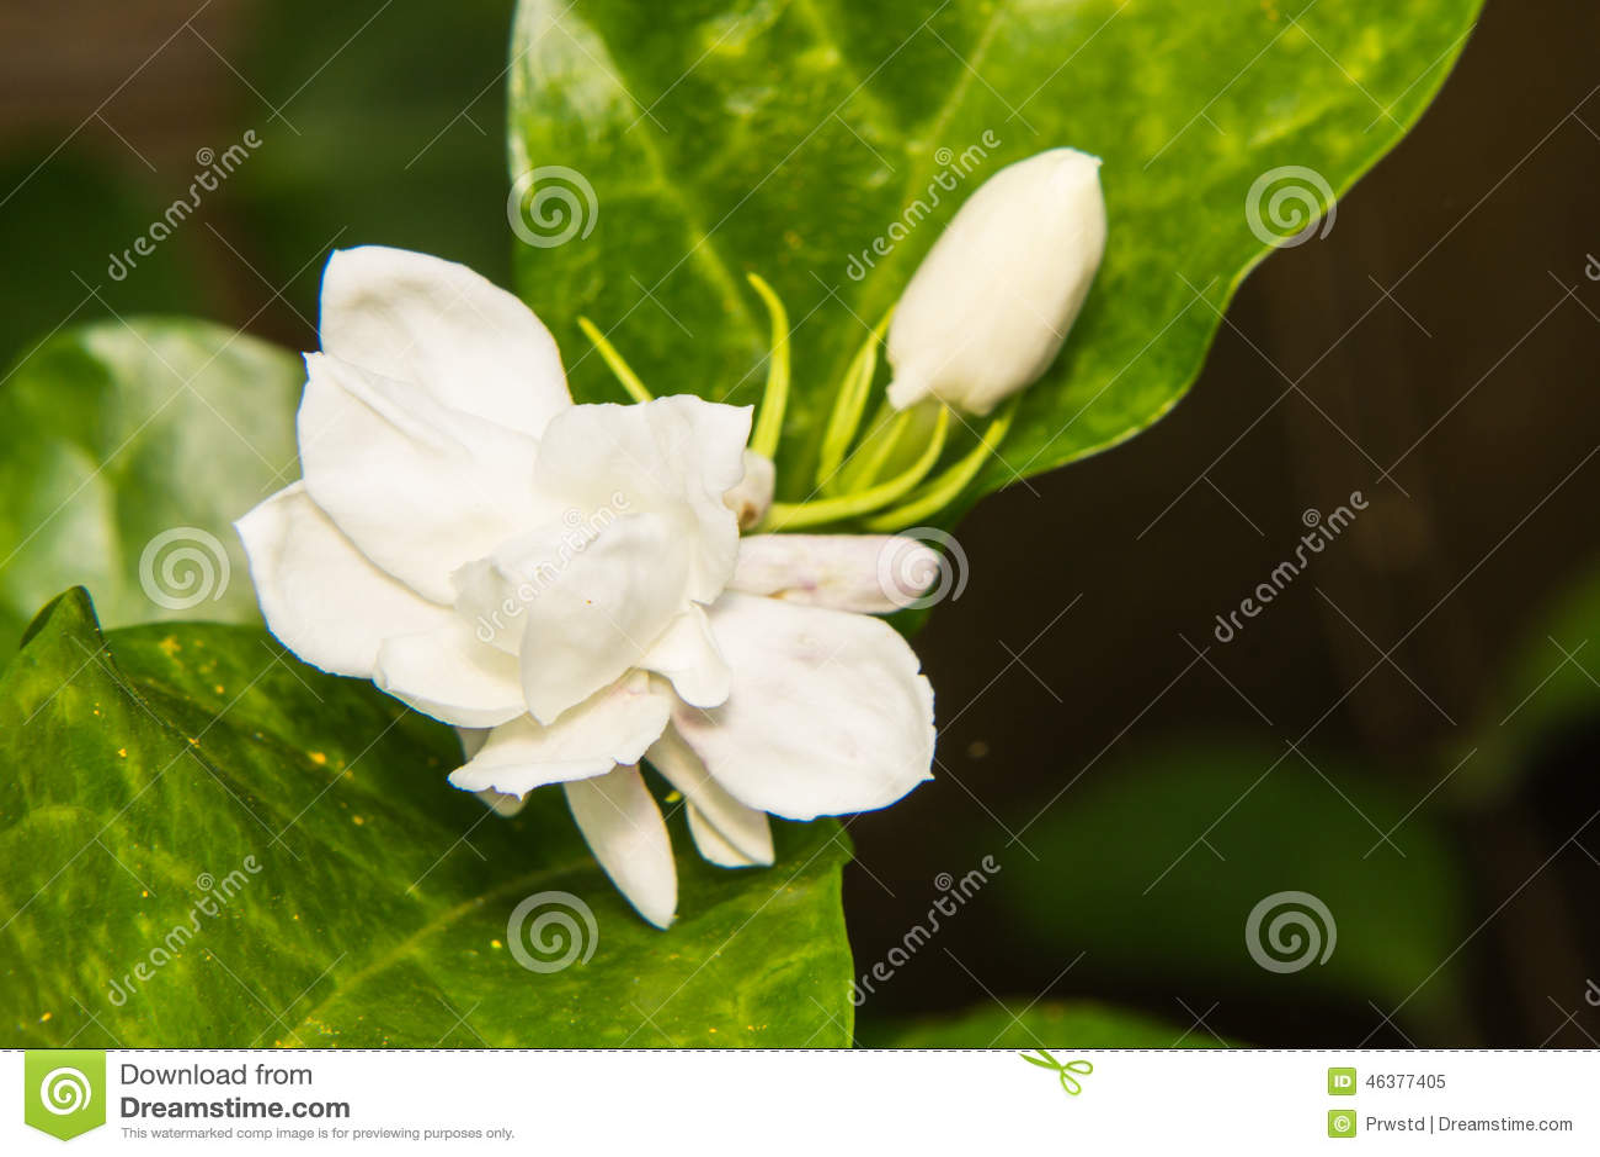 Macro arabian jasmine stock image image of botany flower 46377405 macro arabian jasmine izmirmasajfo